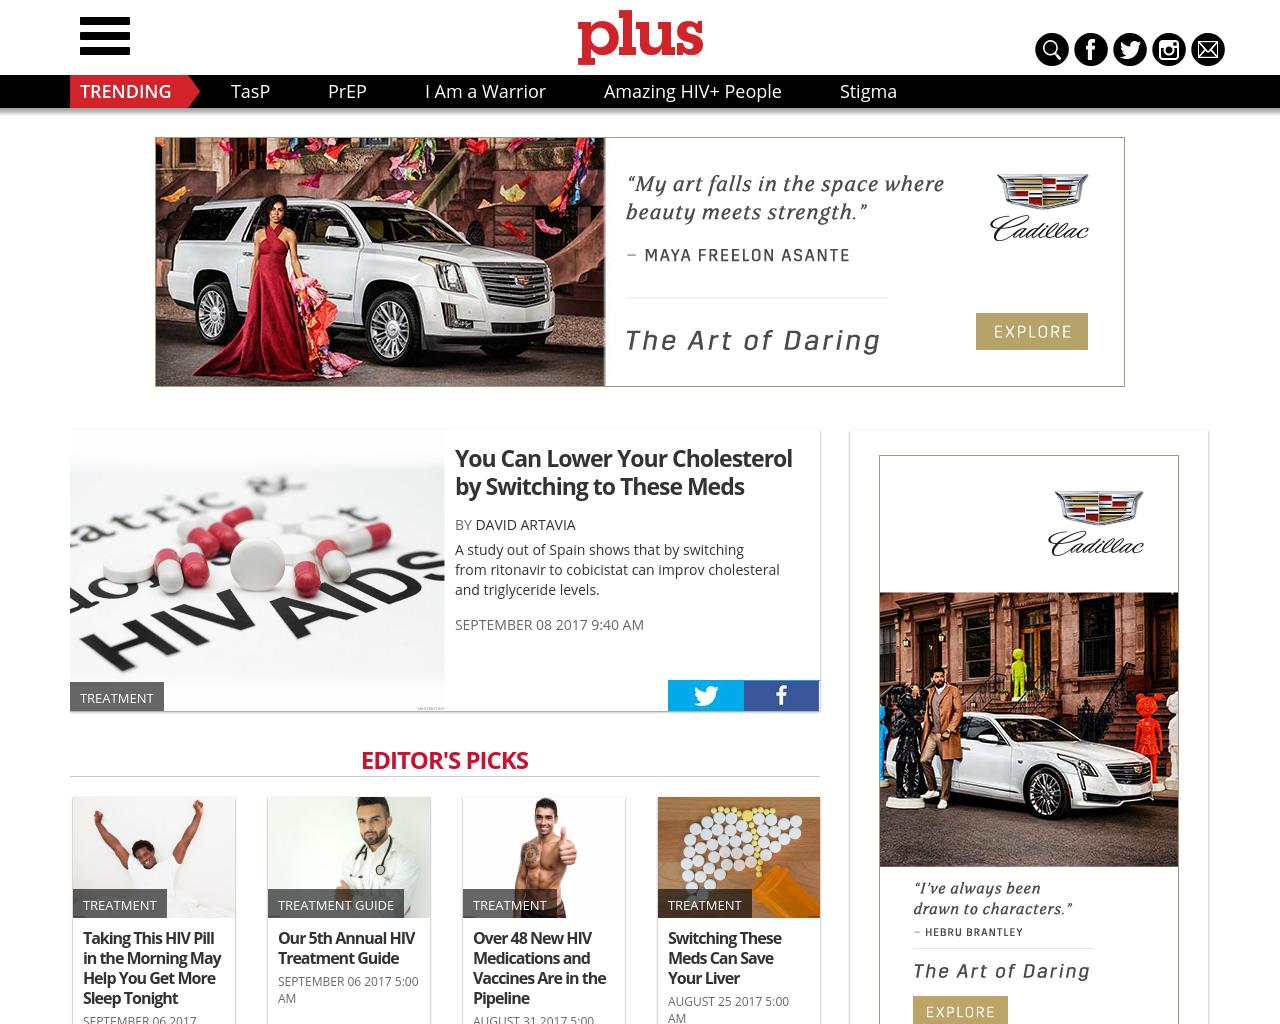 Plus-Advertising-Reviews-Pricing